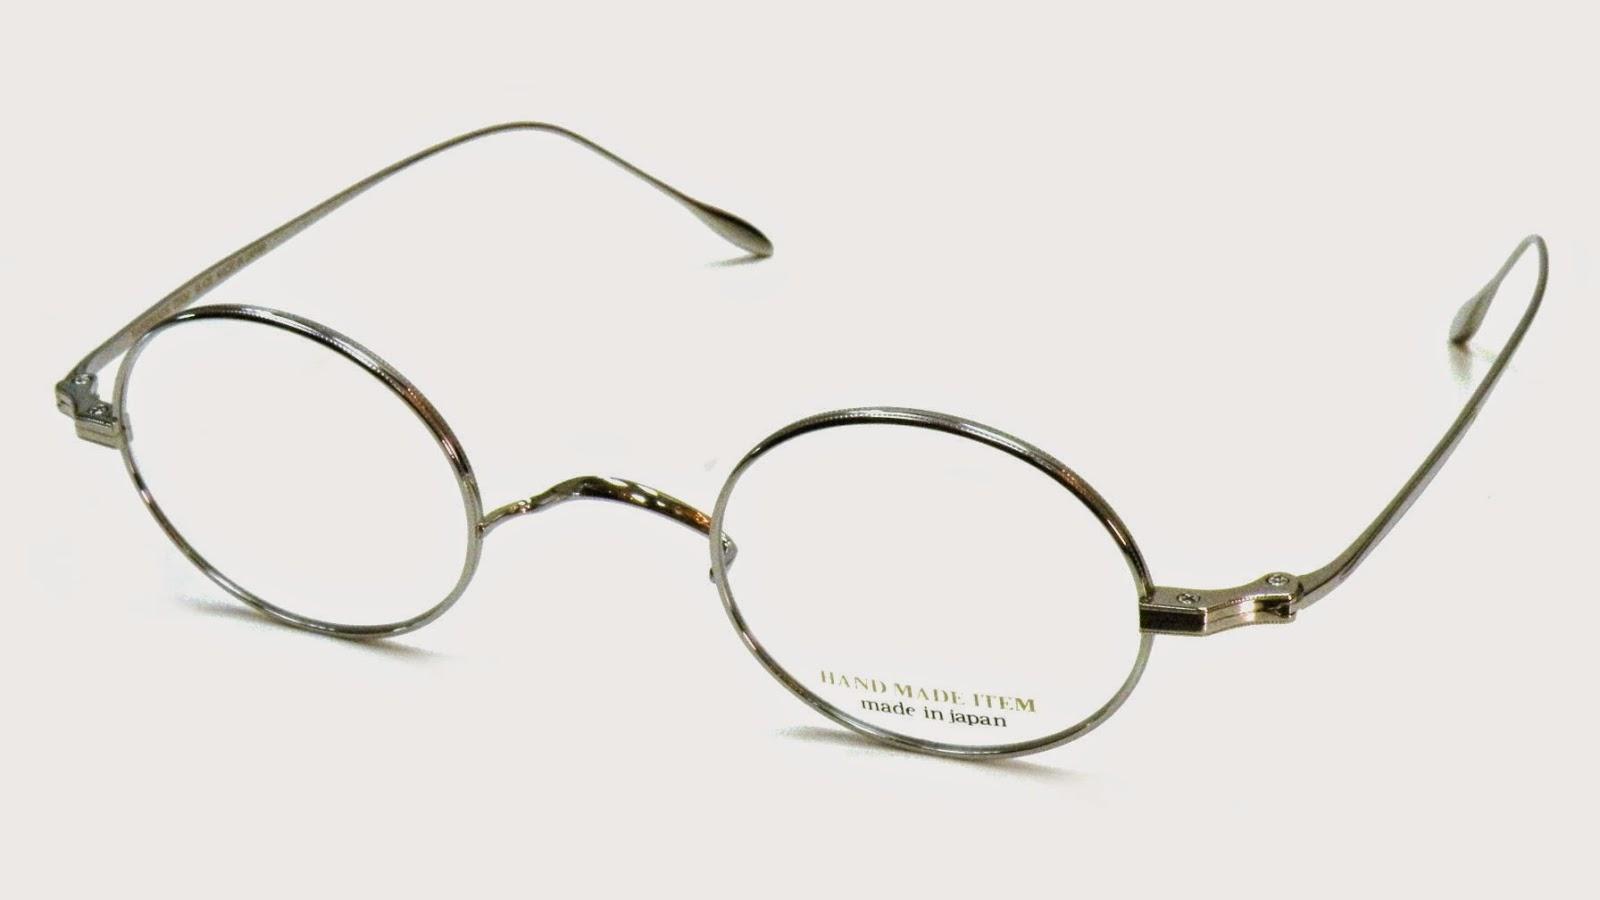 精明眼鏡公司: NOVA HANDMADE ITEM Classic Collection 圓形眼鏡架